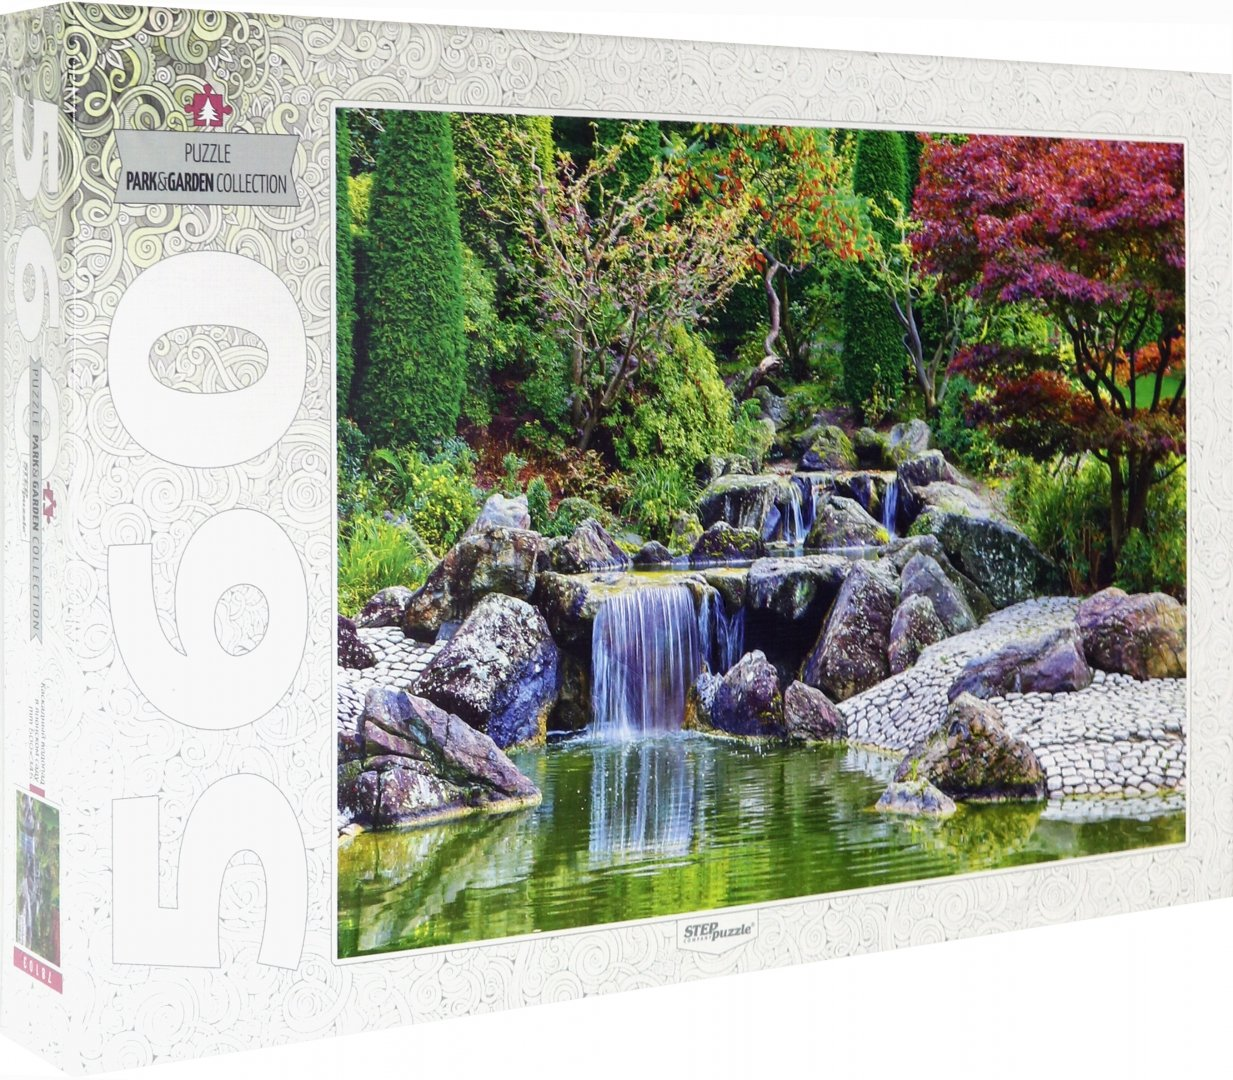 waterfall-at-japanese-garden-bonn-germany